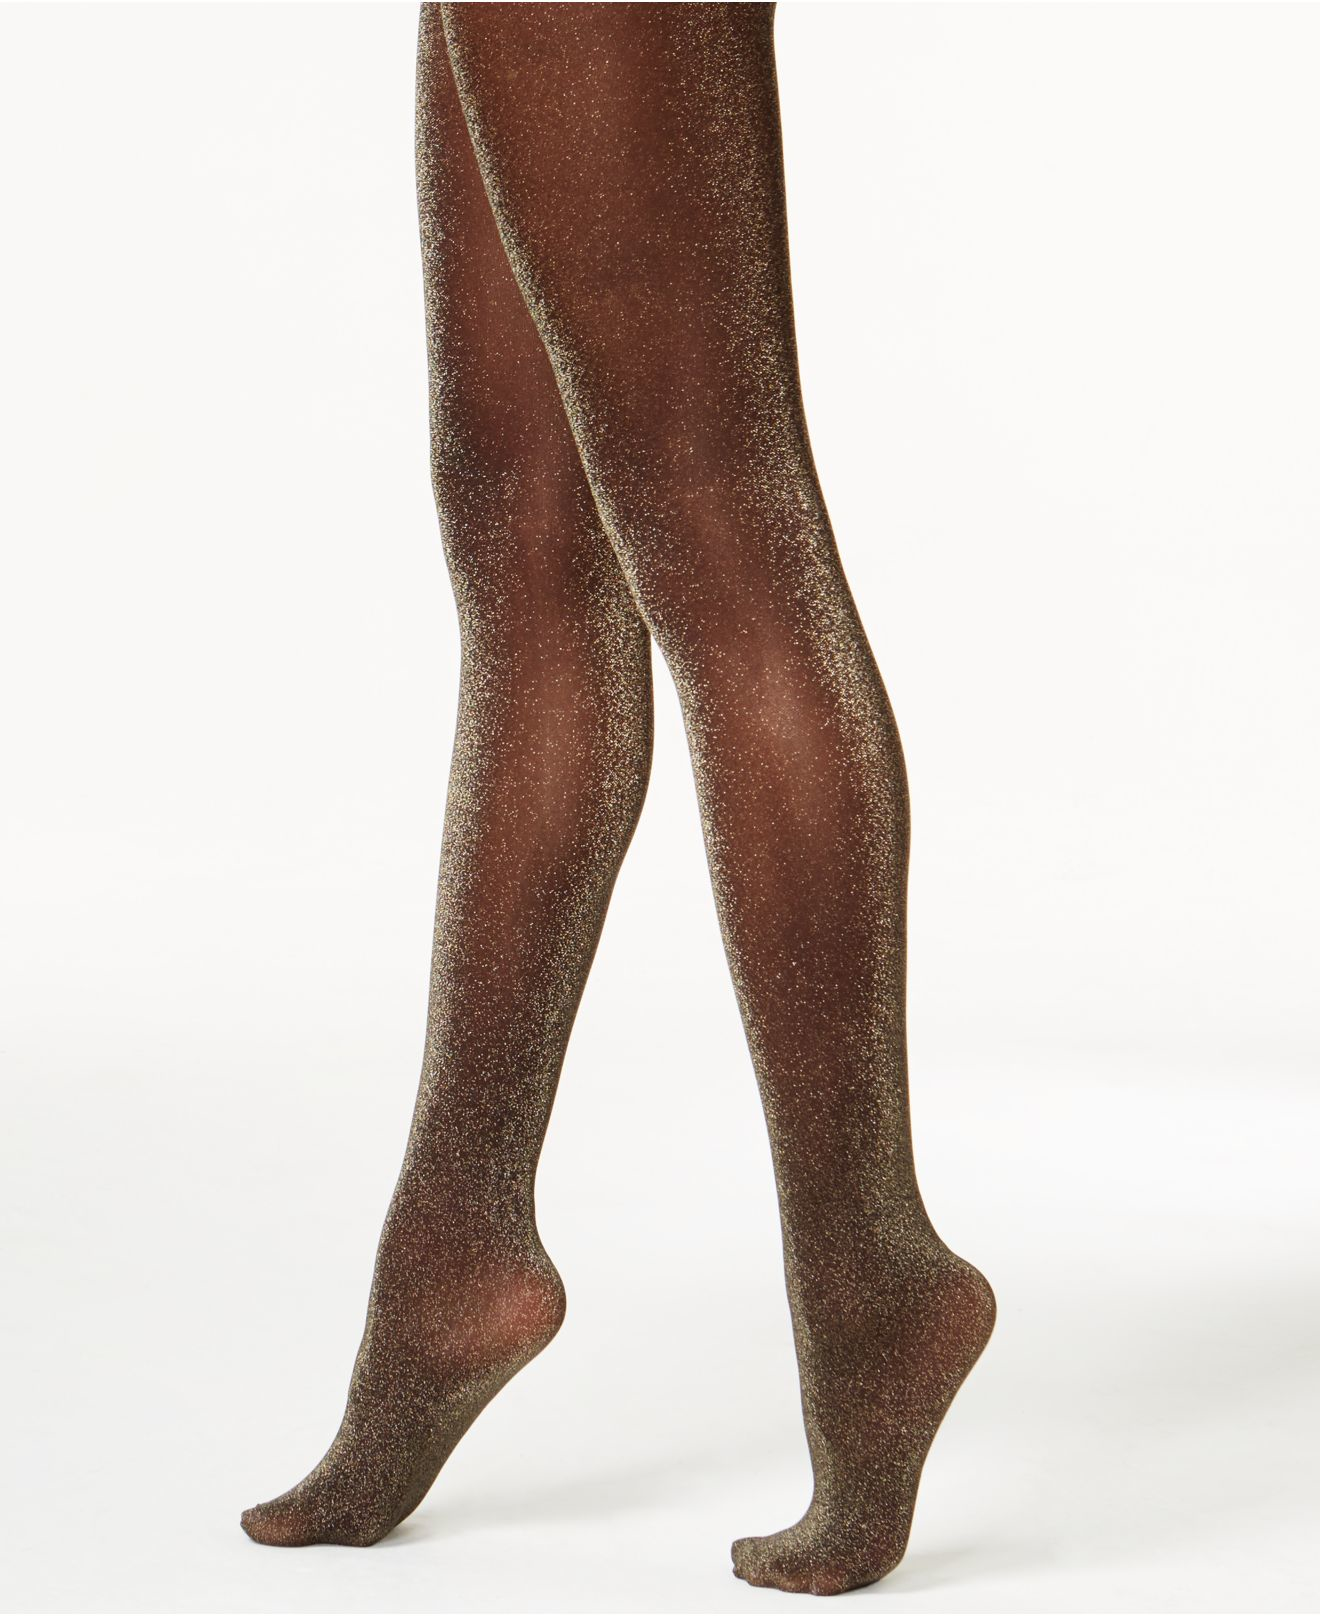 Pantyhose Hue 72